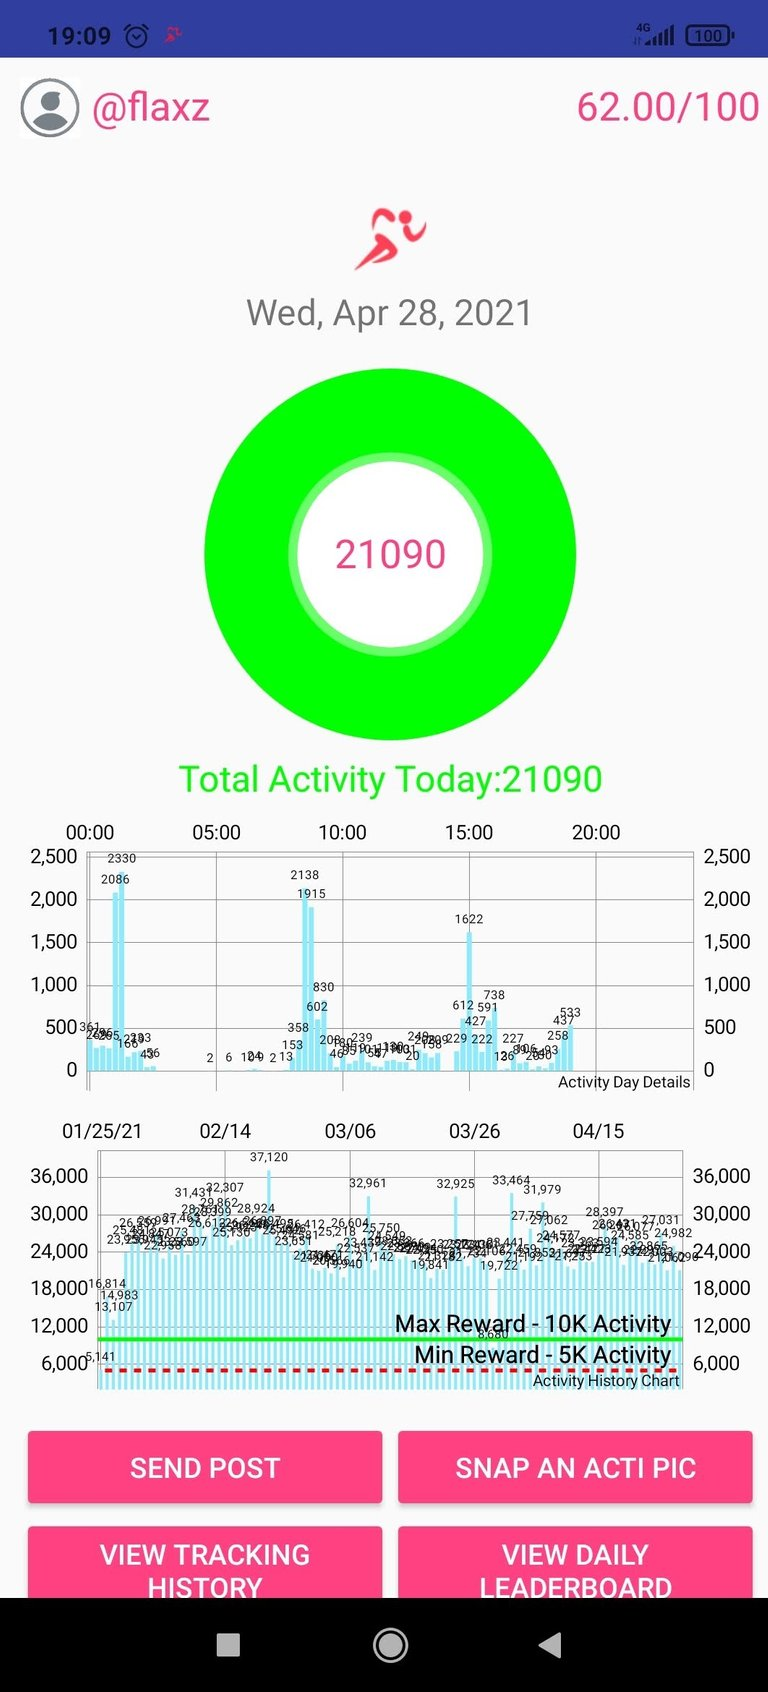 Screenshot_2021-04-28-19-09-45-771_io.actifit.fitnesstracker.actifitfitnesstracker.jpg